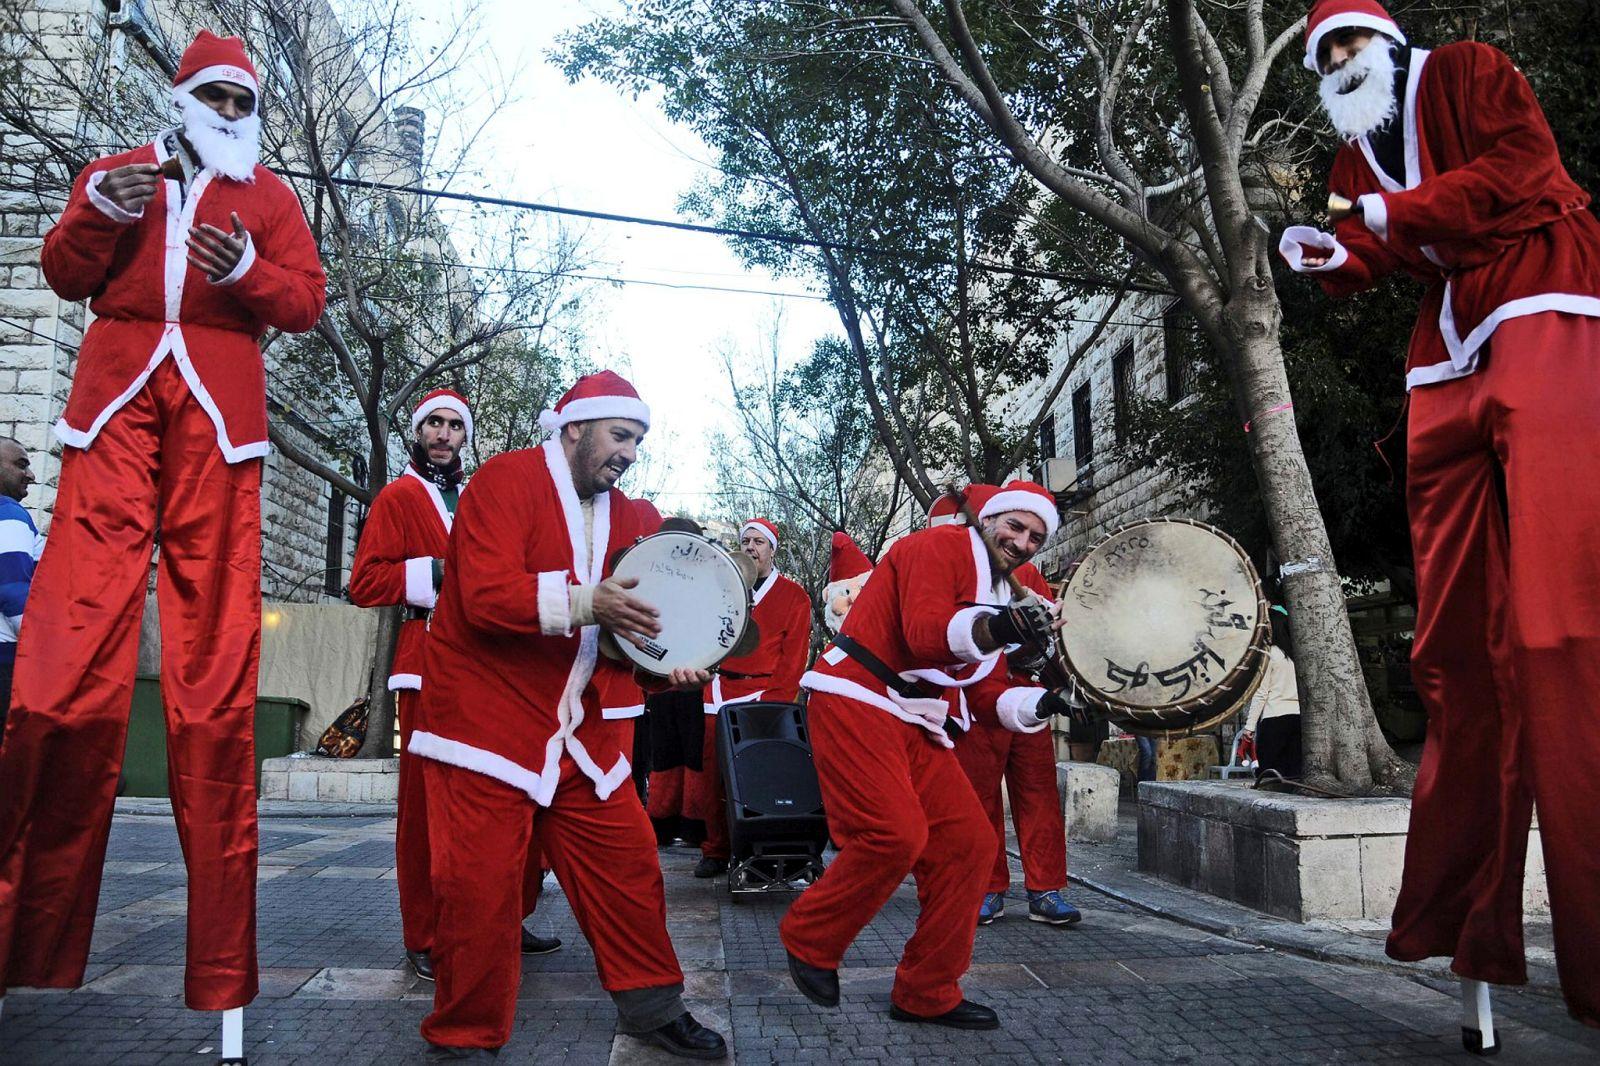 Celebrating Christmas in Nazareth. Photo by Flash90